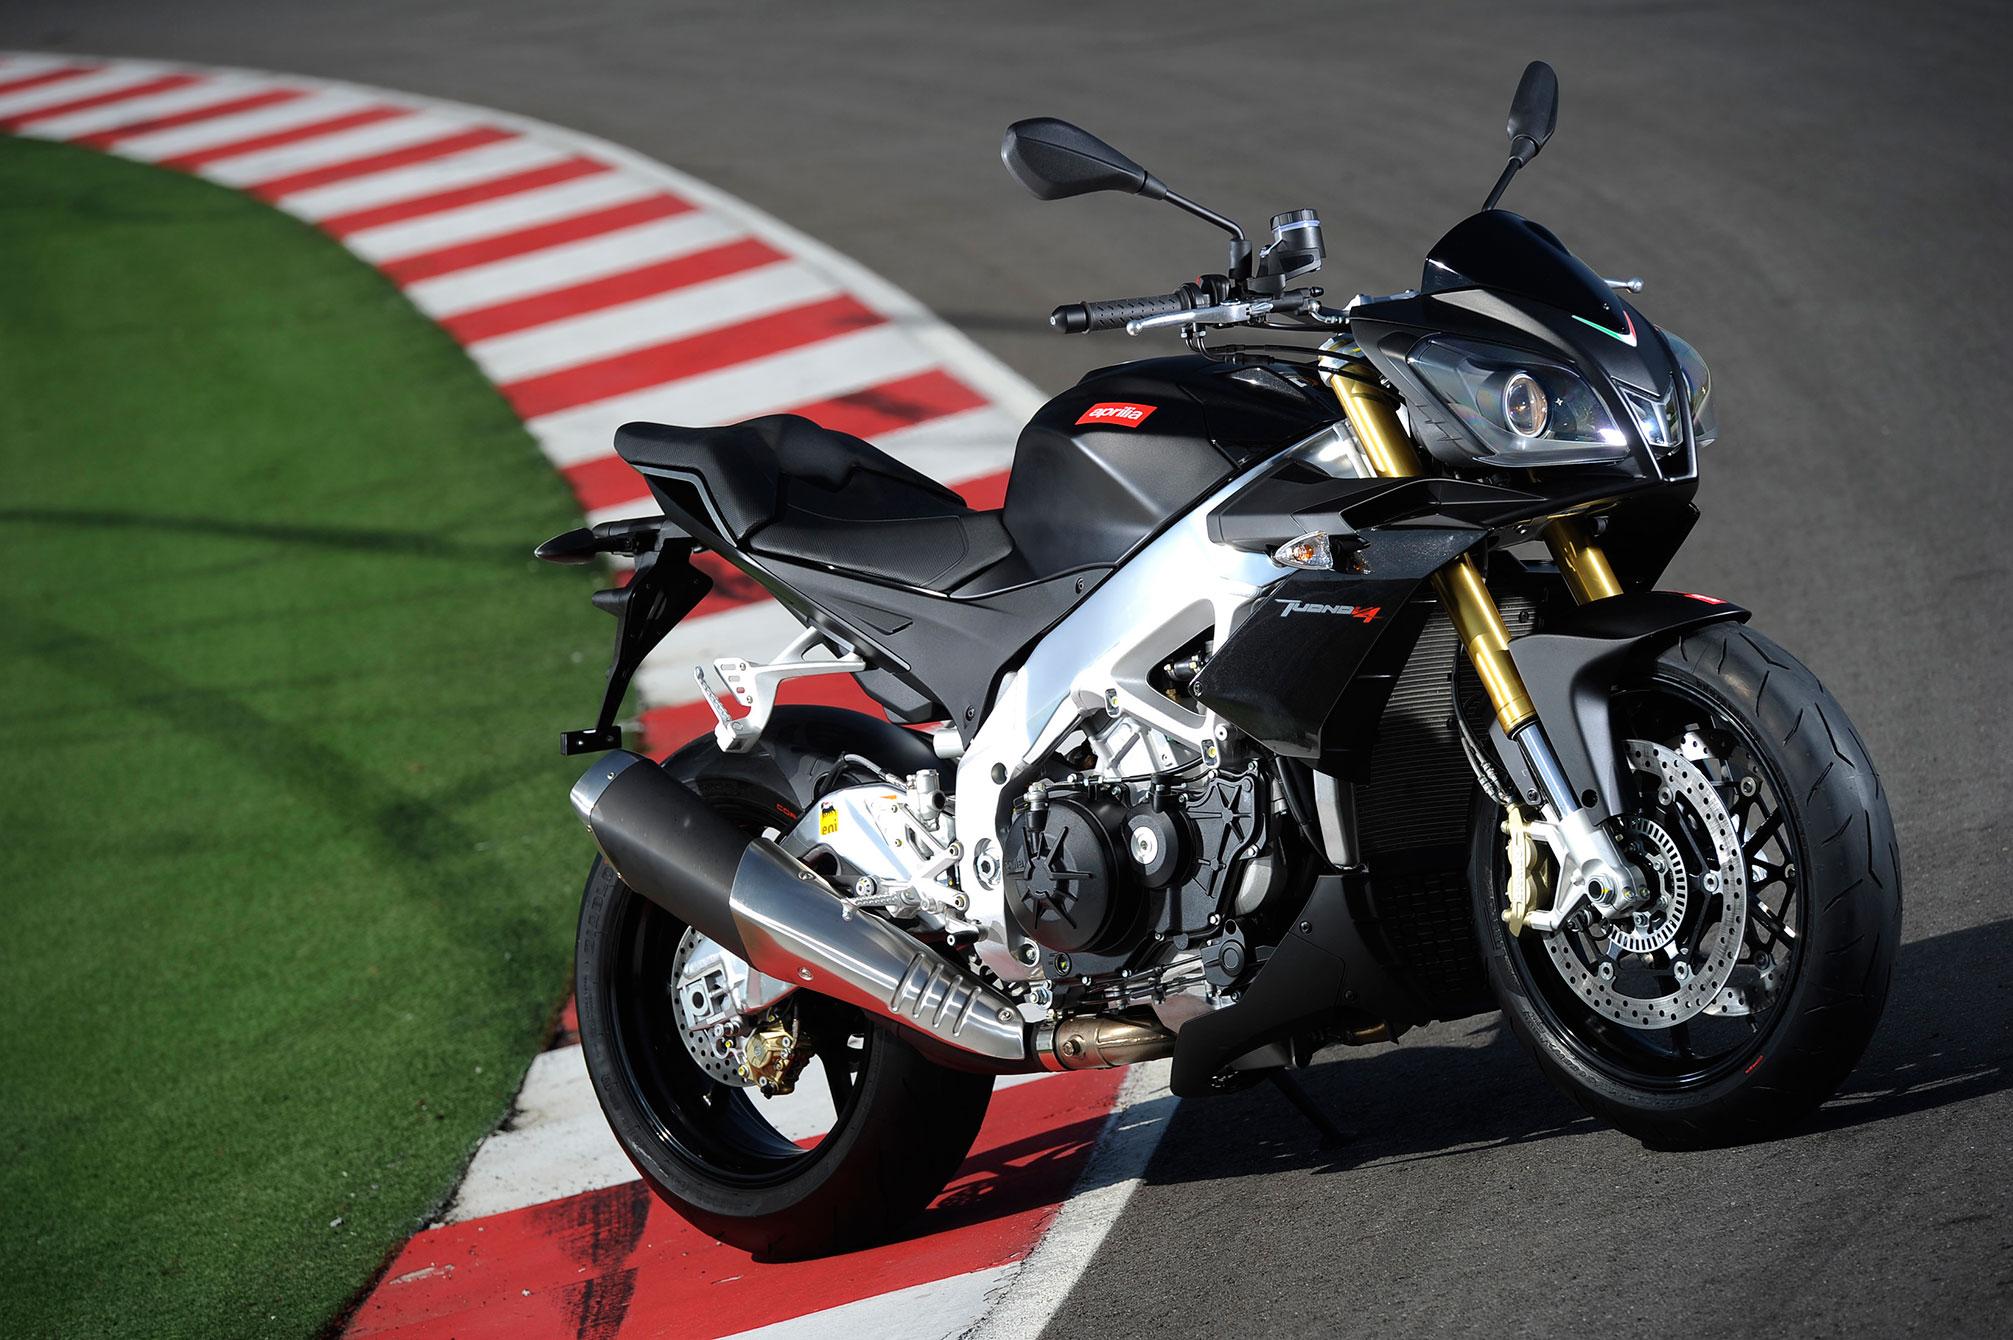 2013 Aprilia Tuono V4 R APRC Motocyclettes - Motos Illimitées